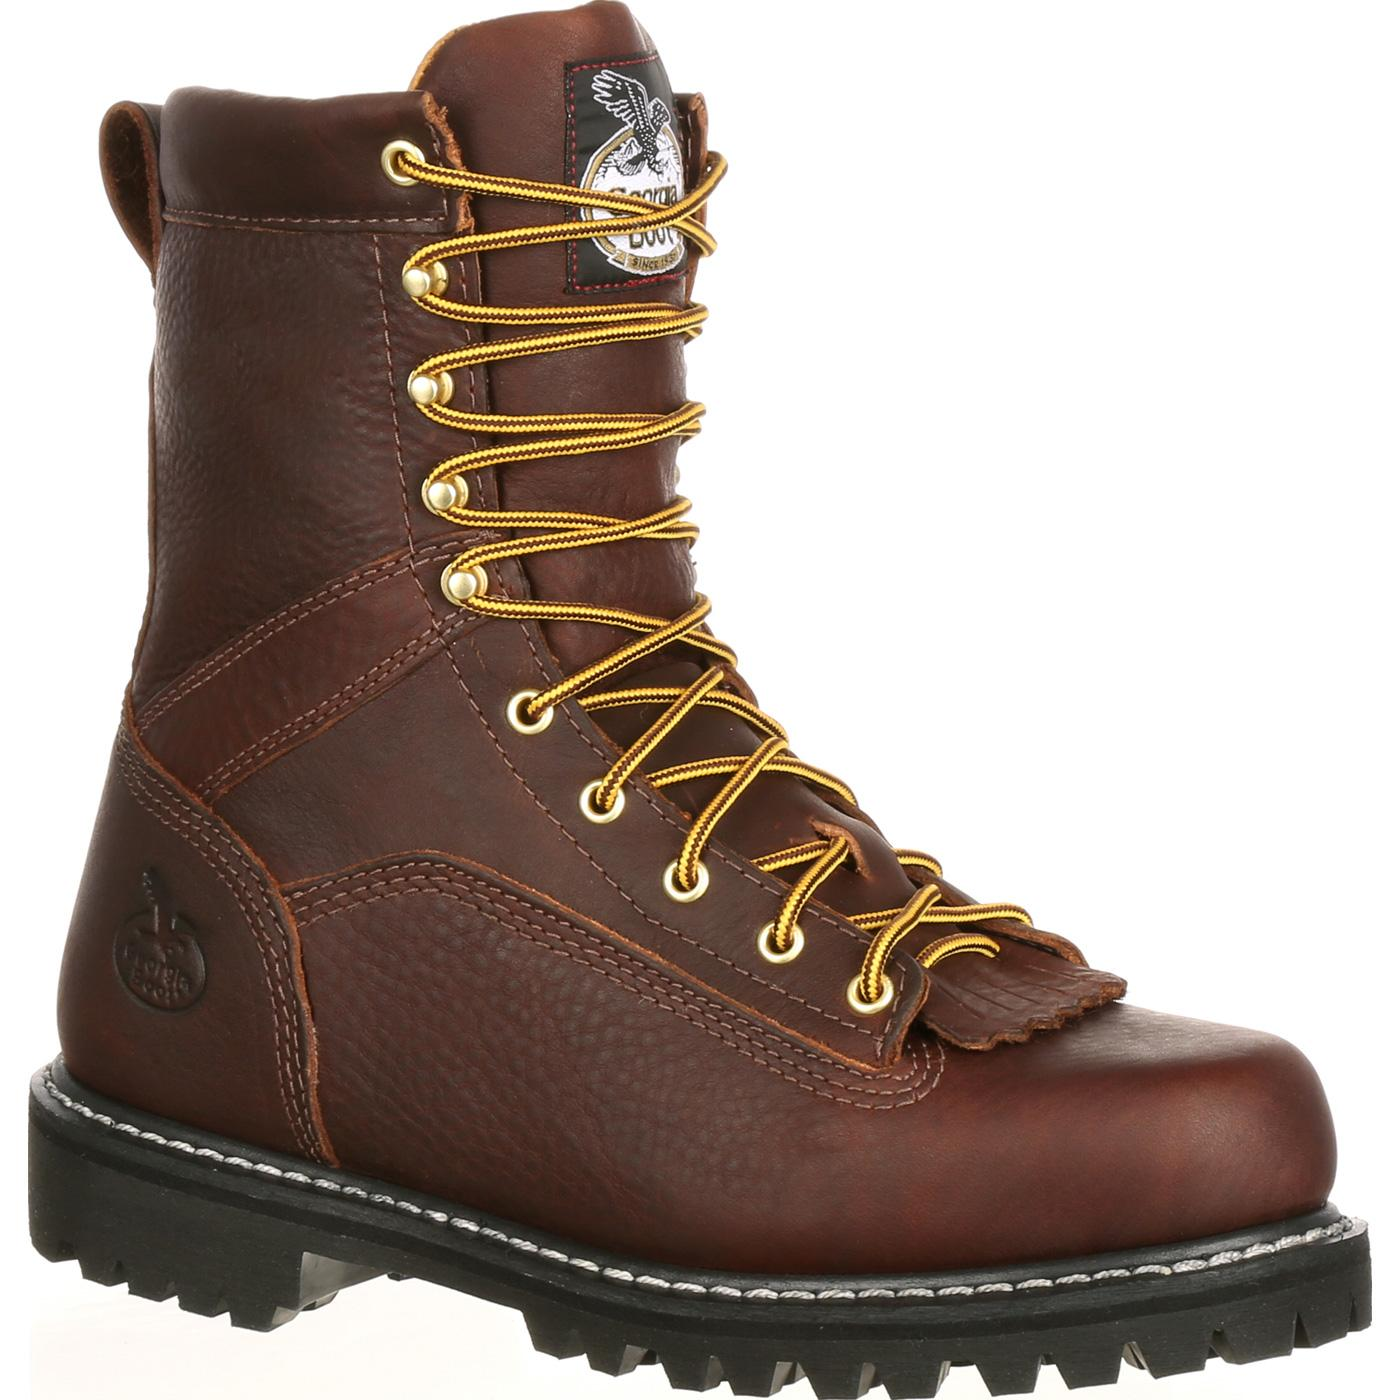 1de79a97e004 Georgia Boot Lace-To-Toe Vibram Work Boot